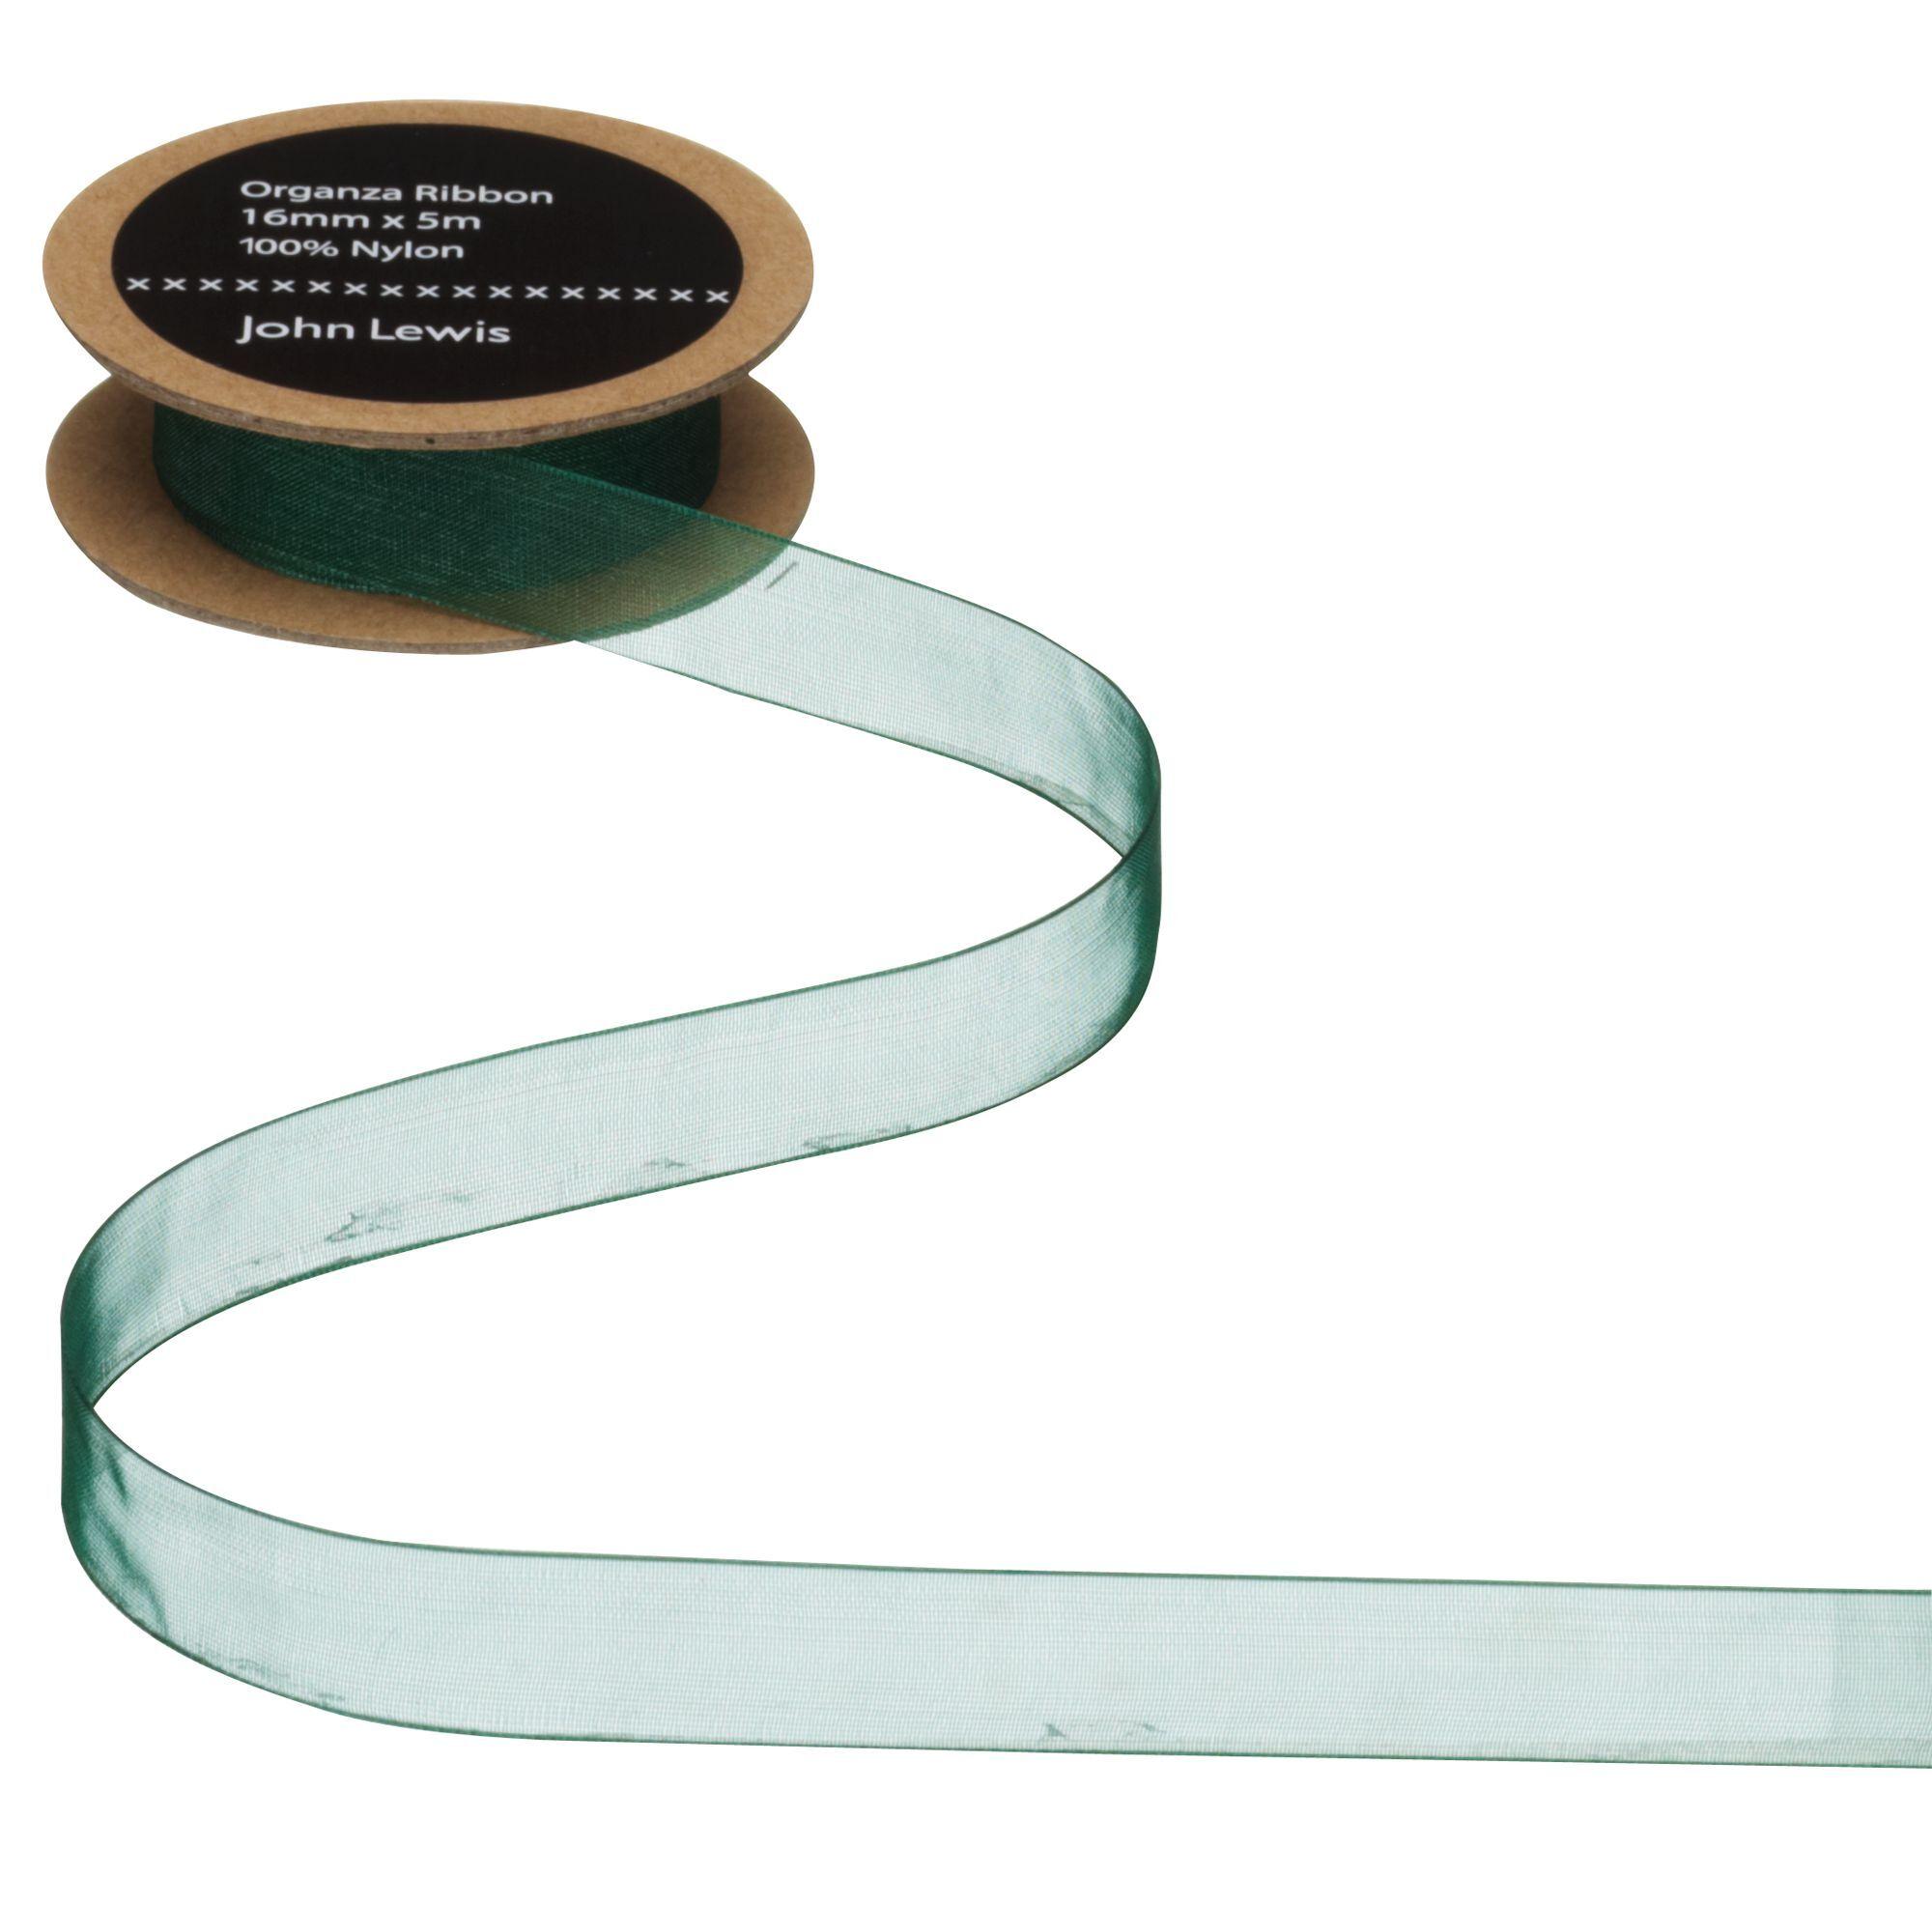 John Lewis & Partners Woven Edge Organza Ribbon  - Green - Size: 16mm